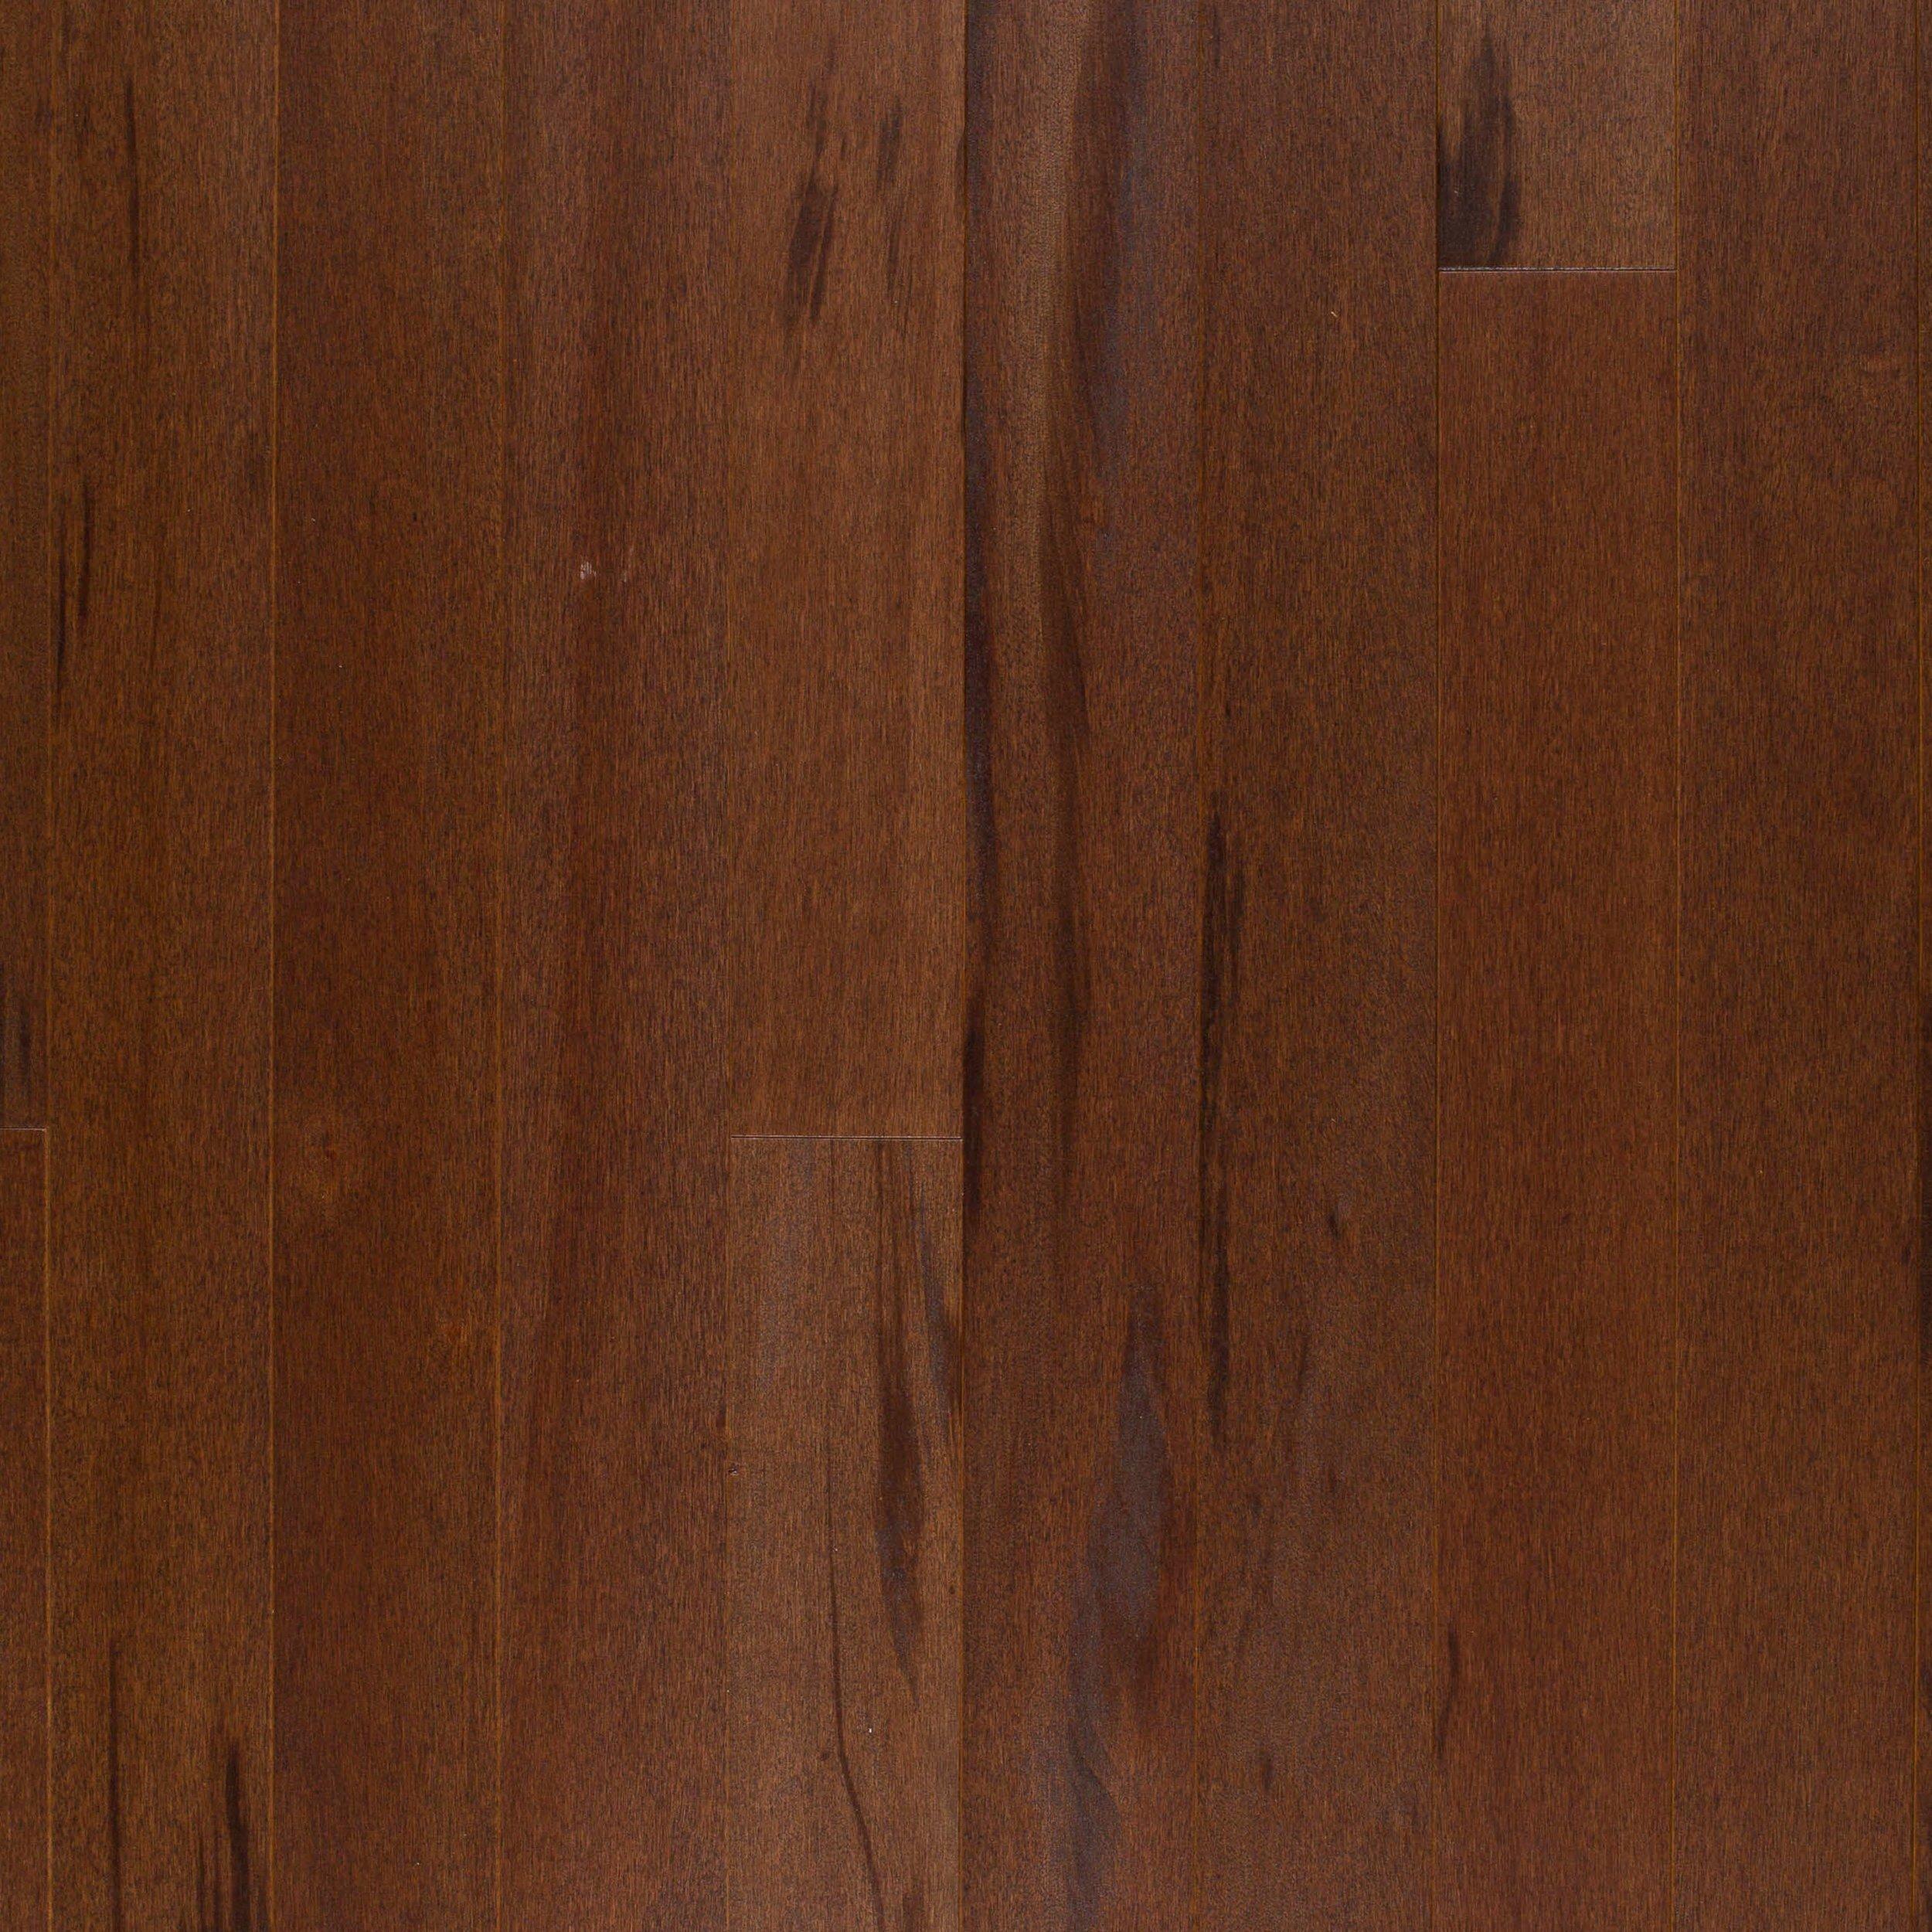 Burros Brown Brazilian Tigerwood Solid Hardwood